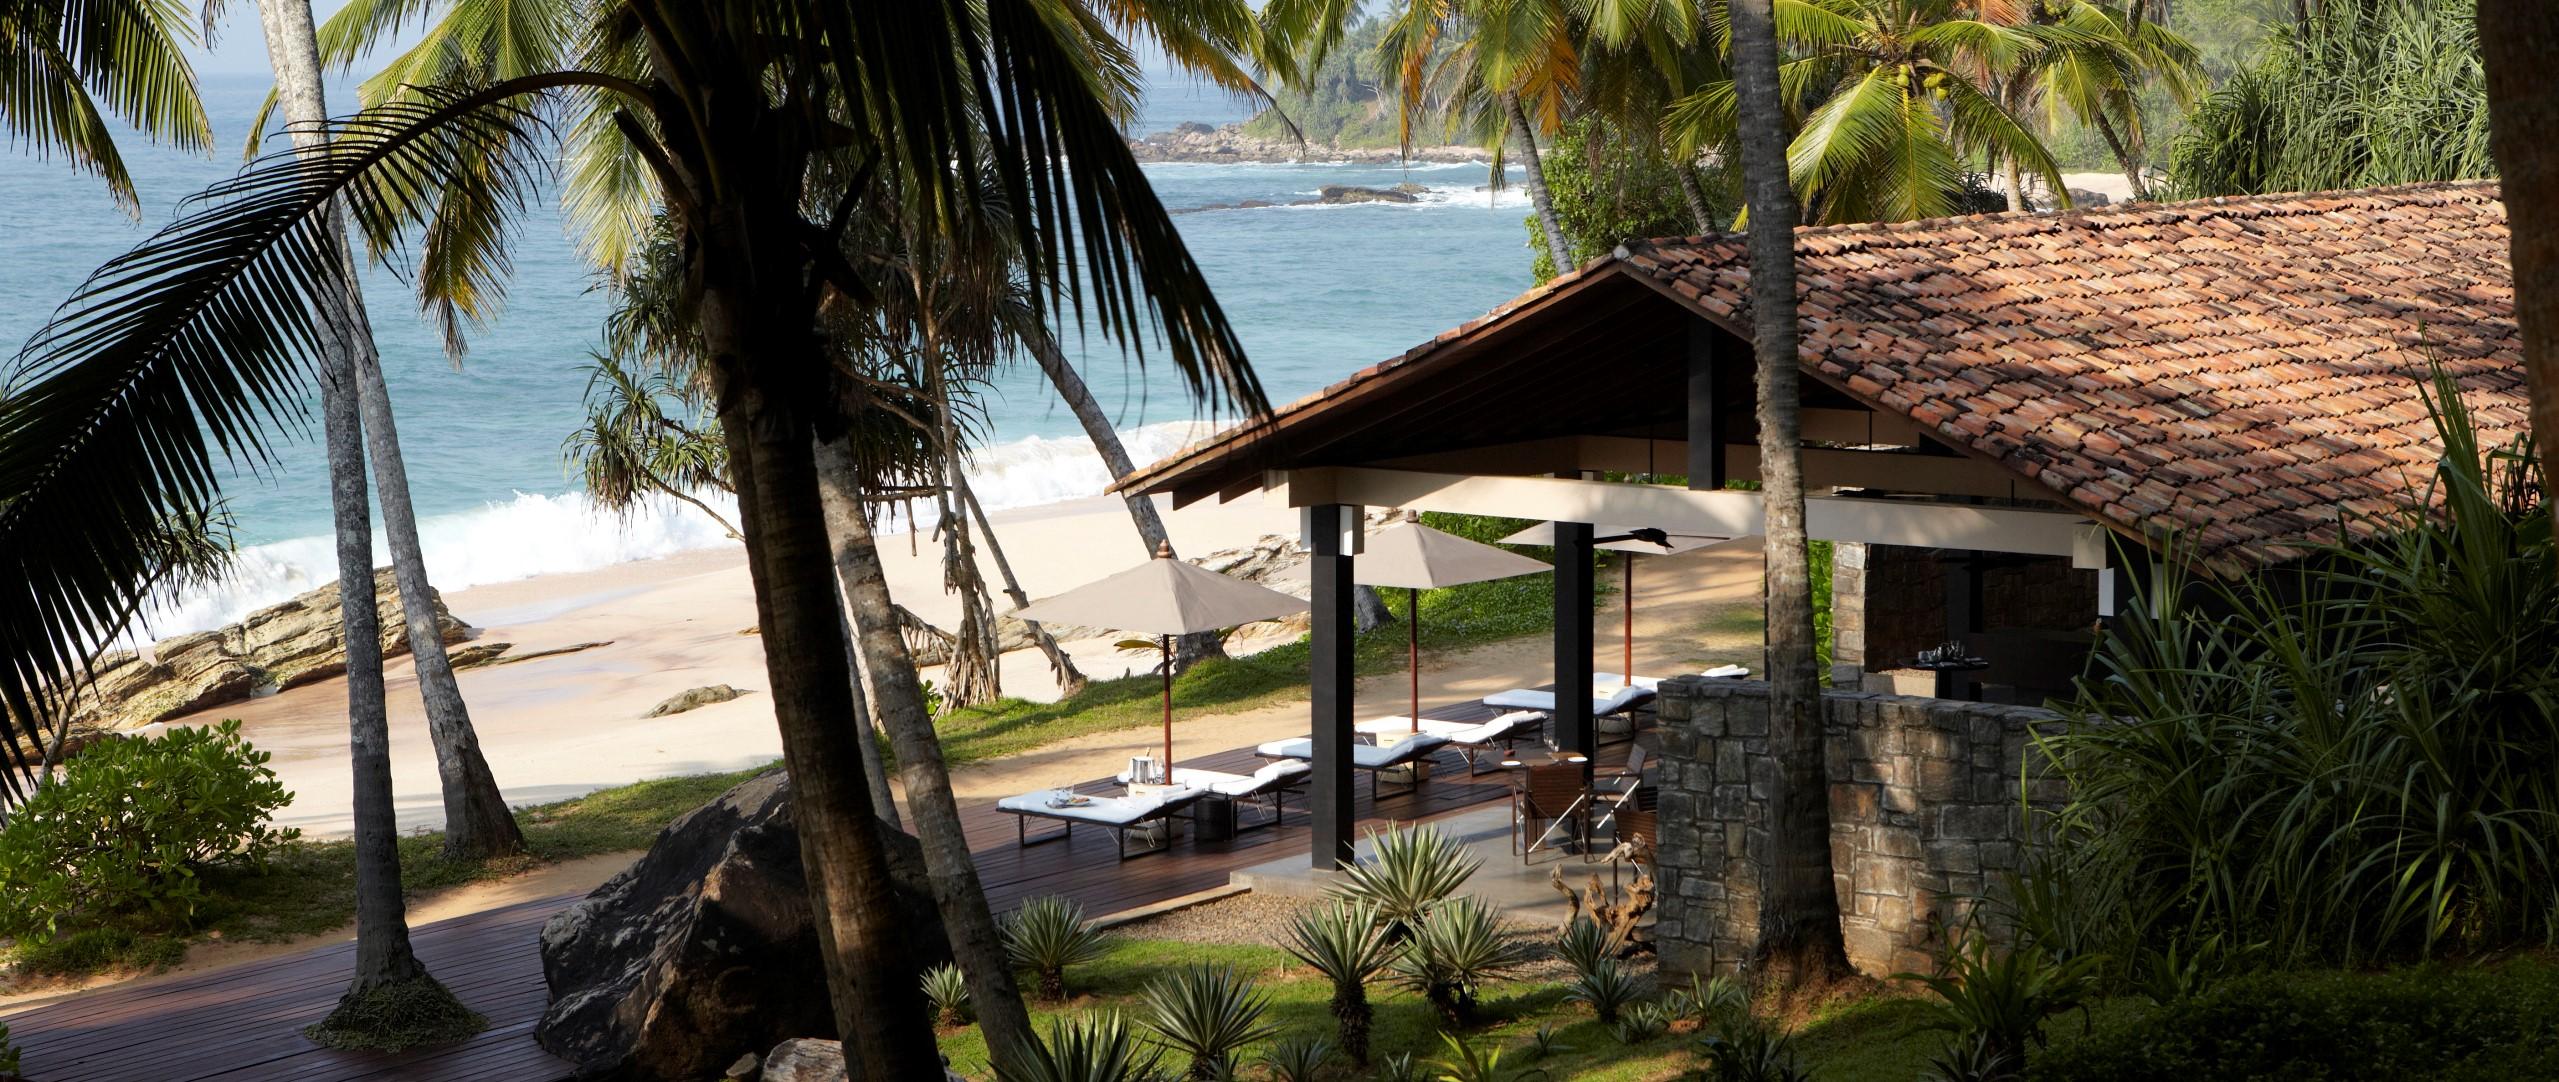 Amanwella-Sri-Lanka-Beach-Club